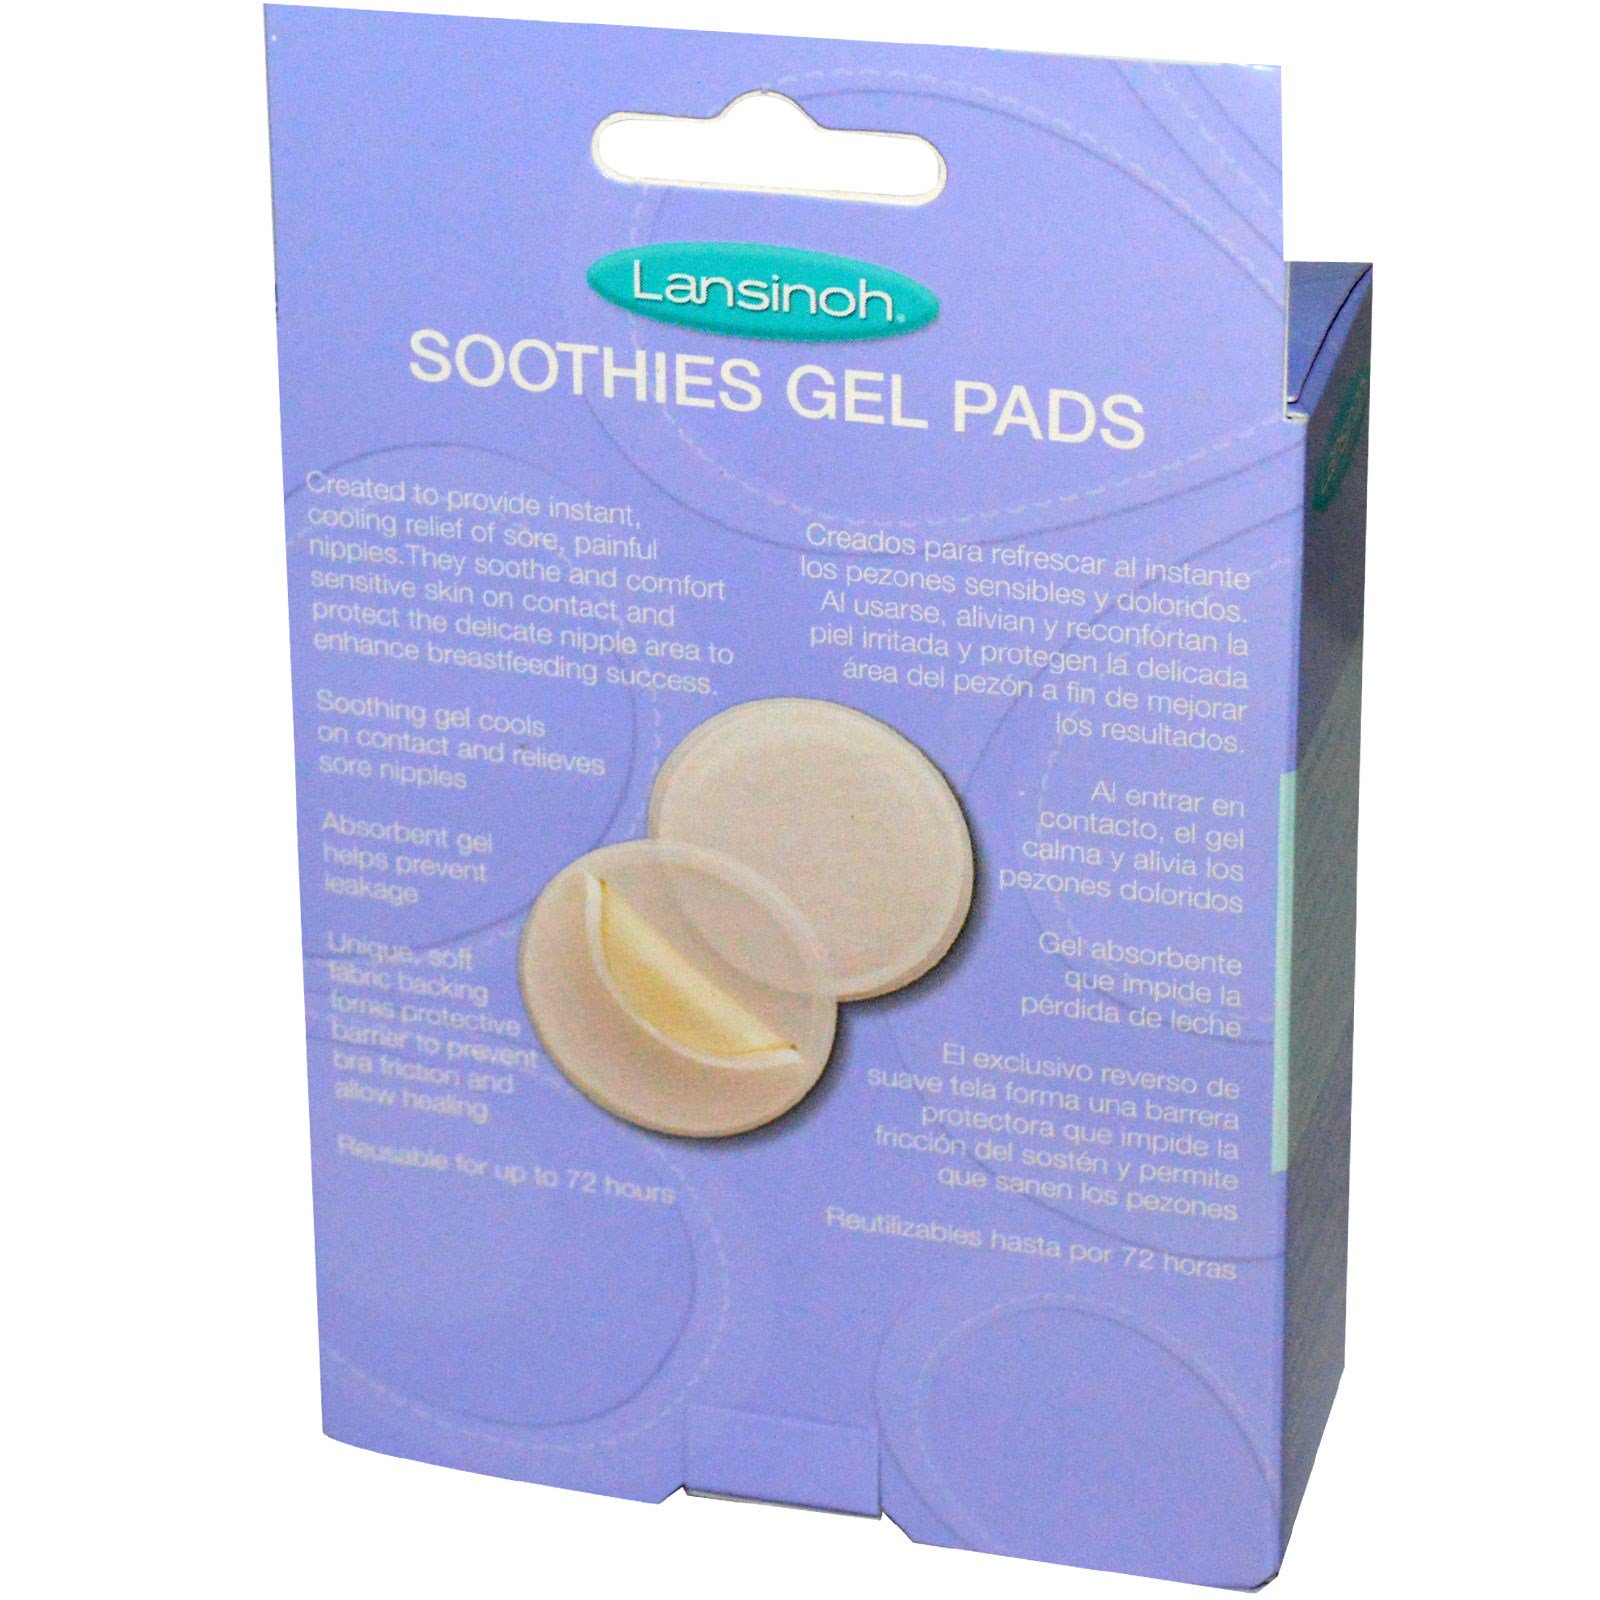 Lansinoh gel pads reviews